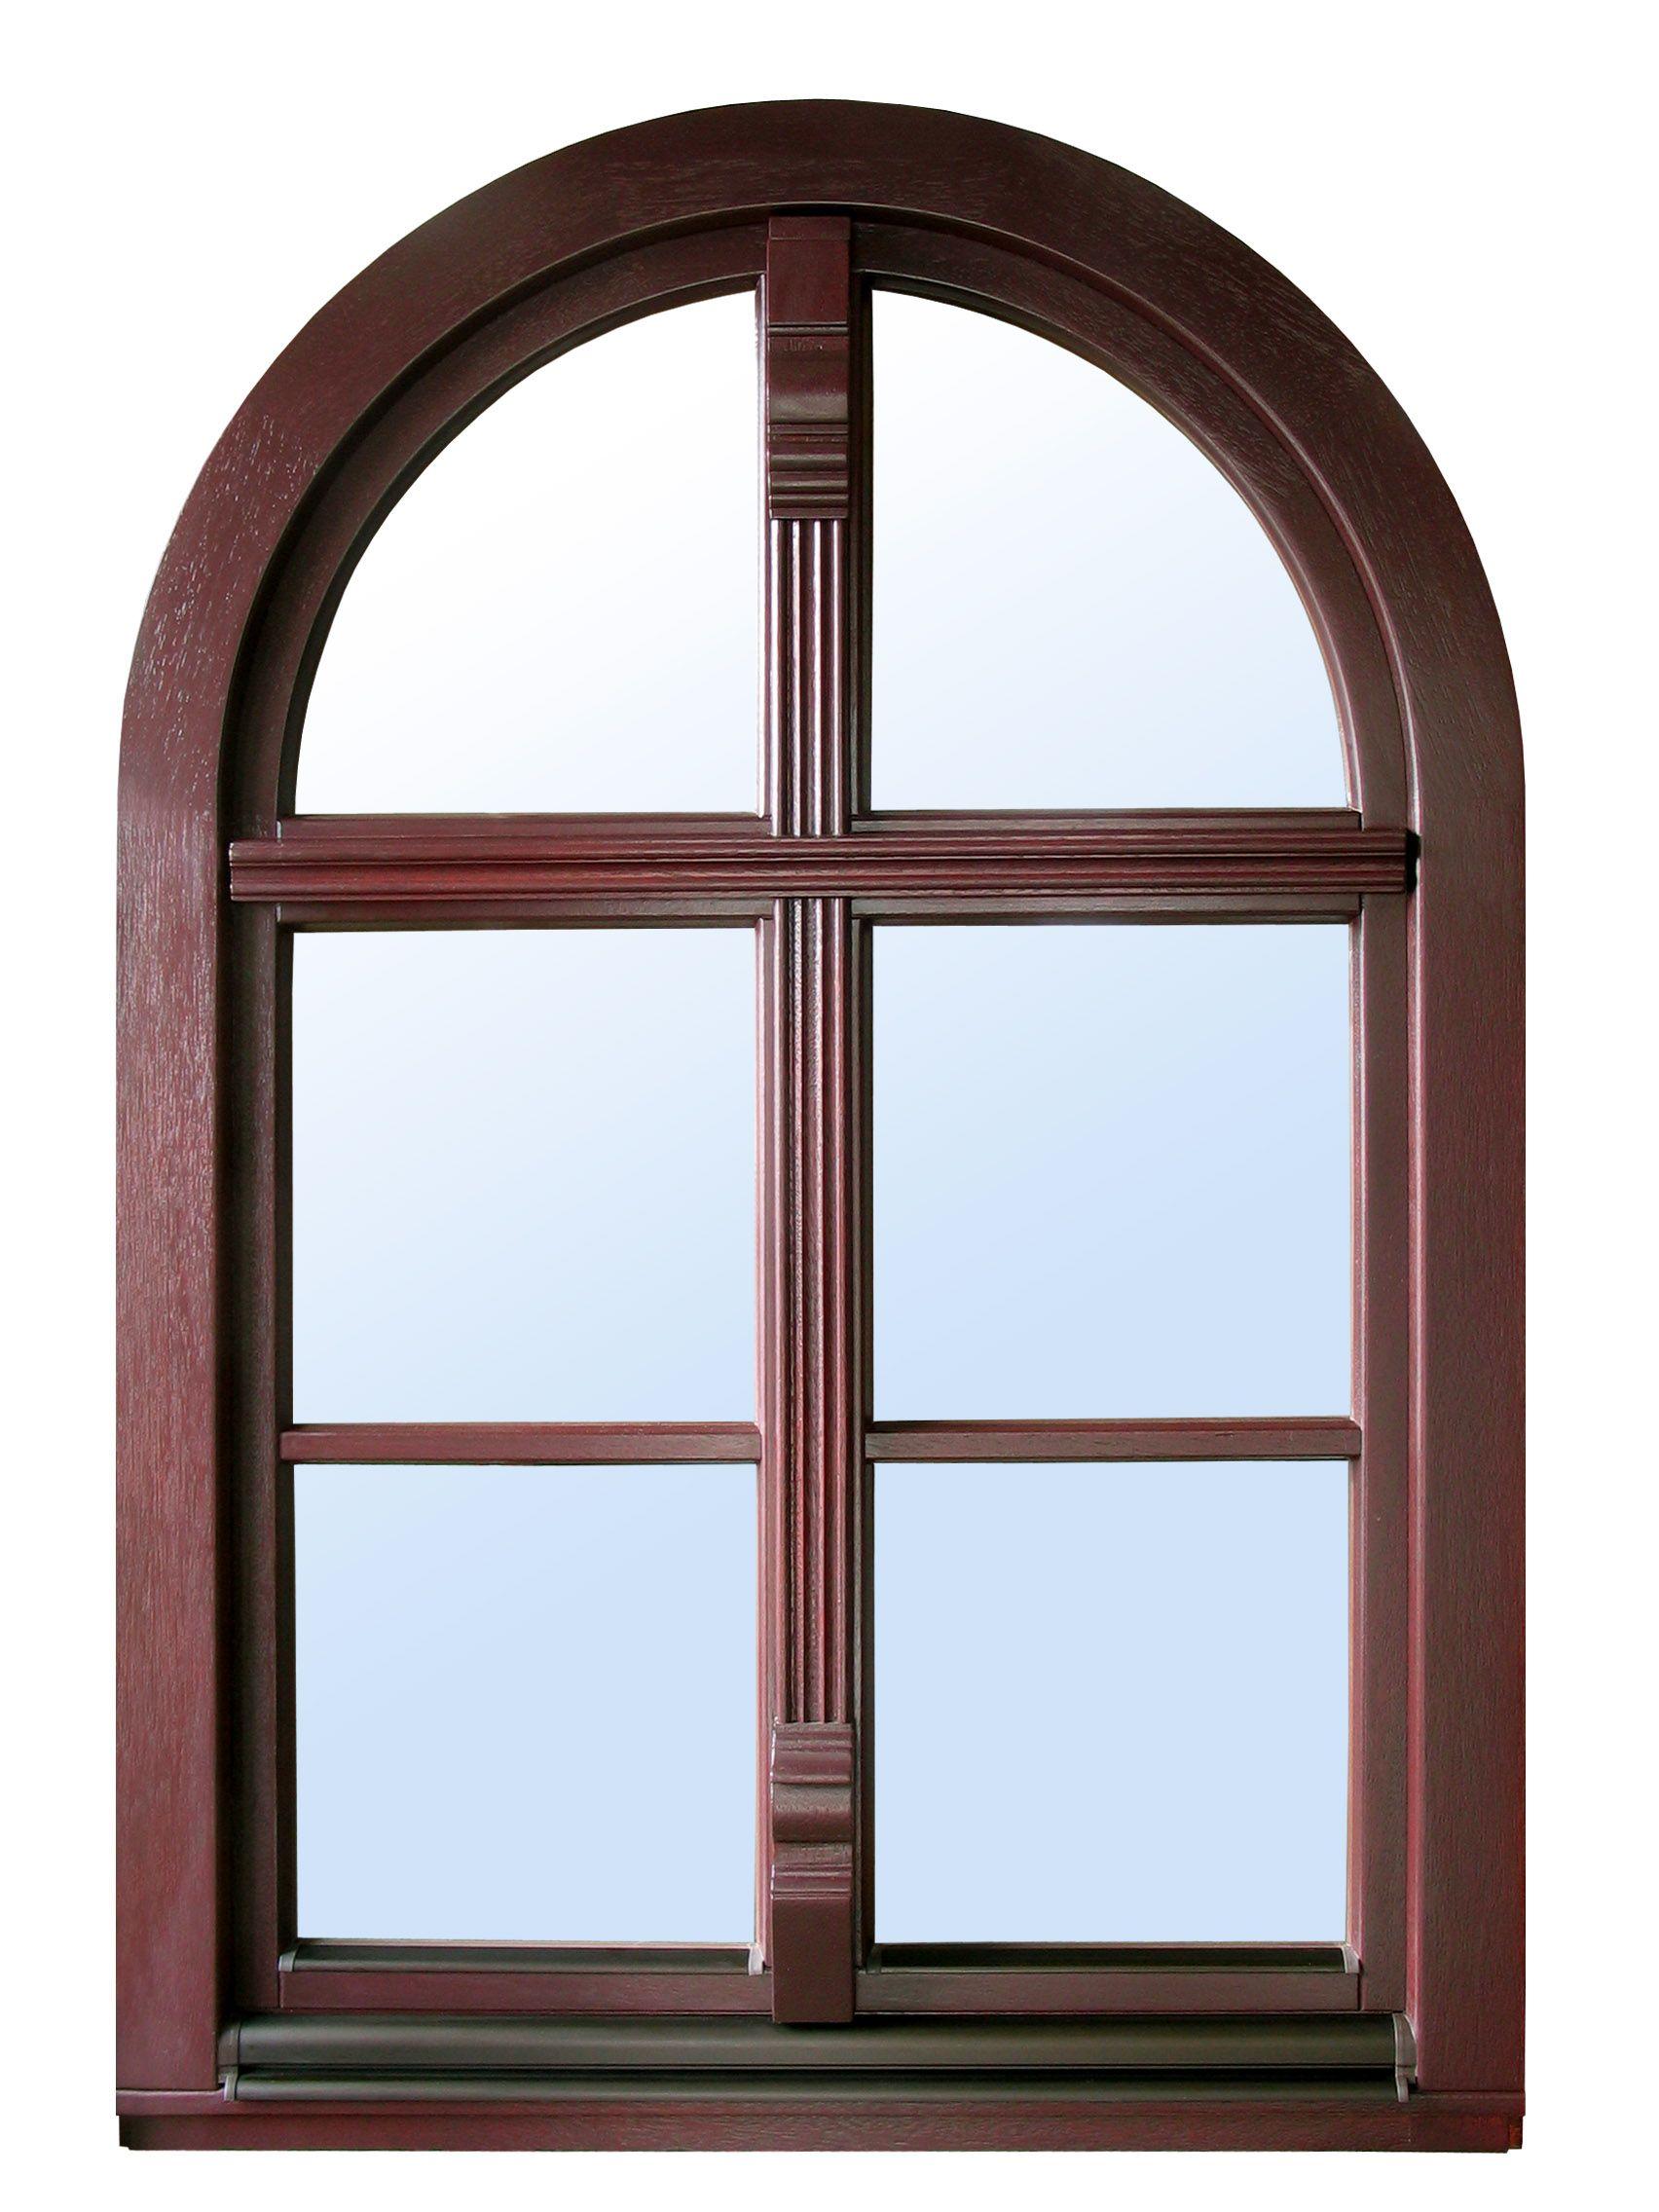 Wood Windows Price Front Window Design Wood Windows Doors Interior Modern